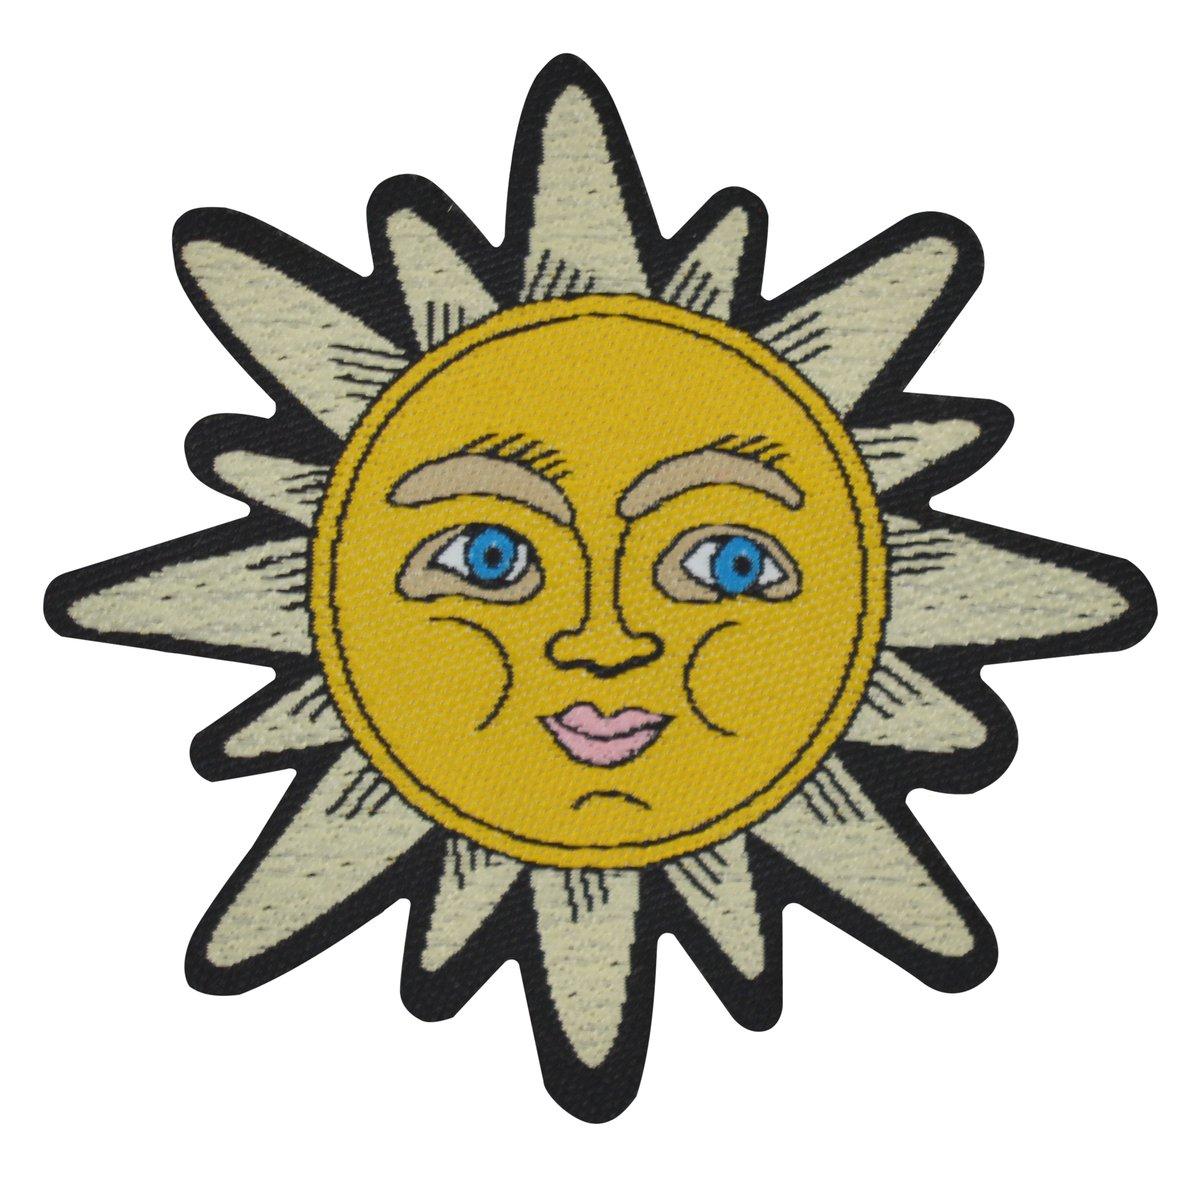 Celestial Sun Iron-on Patch